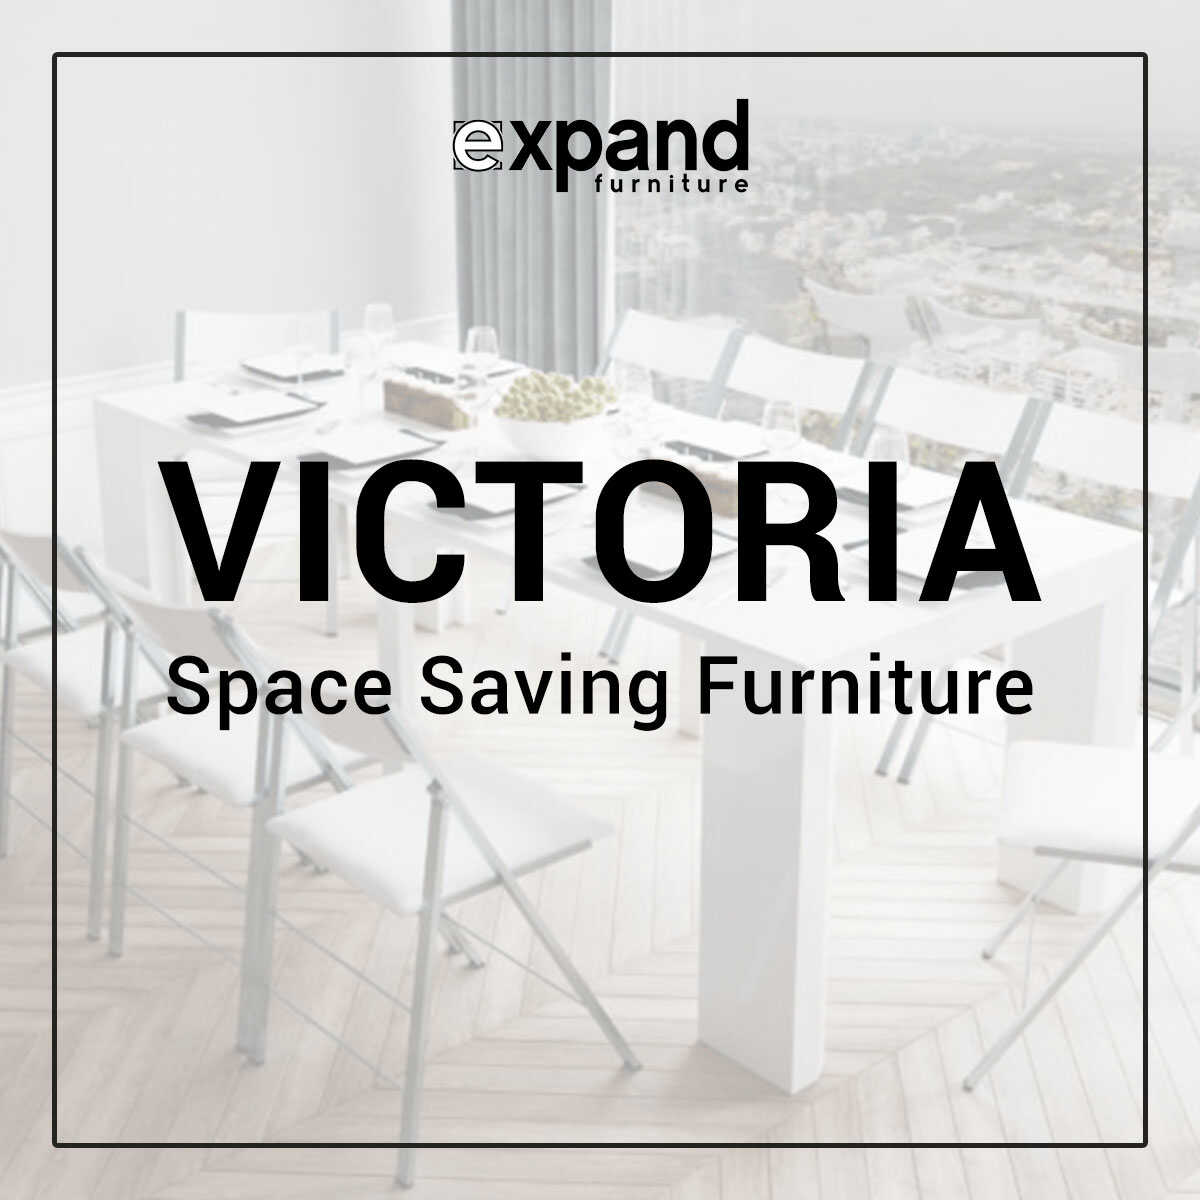 Victoria Space Saving Furniture featured image